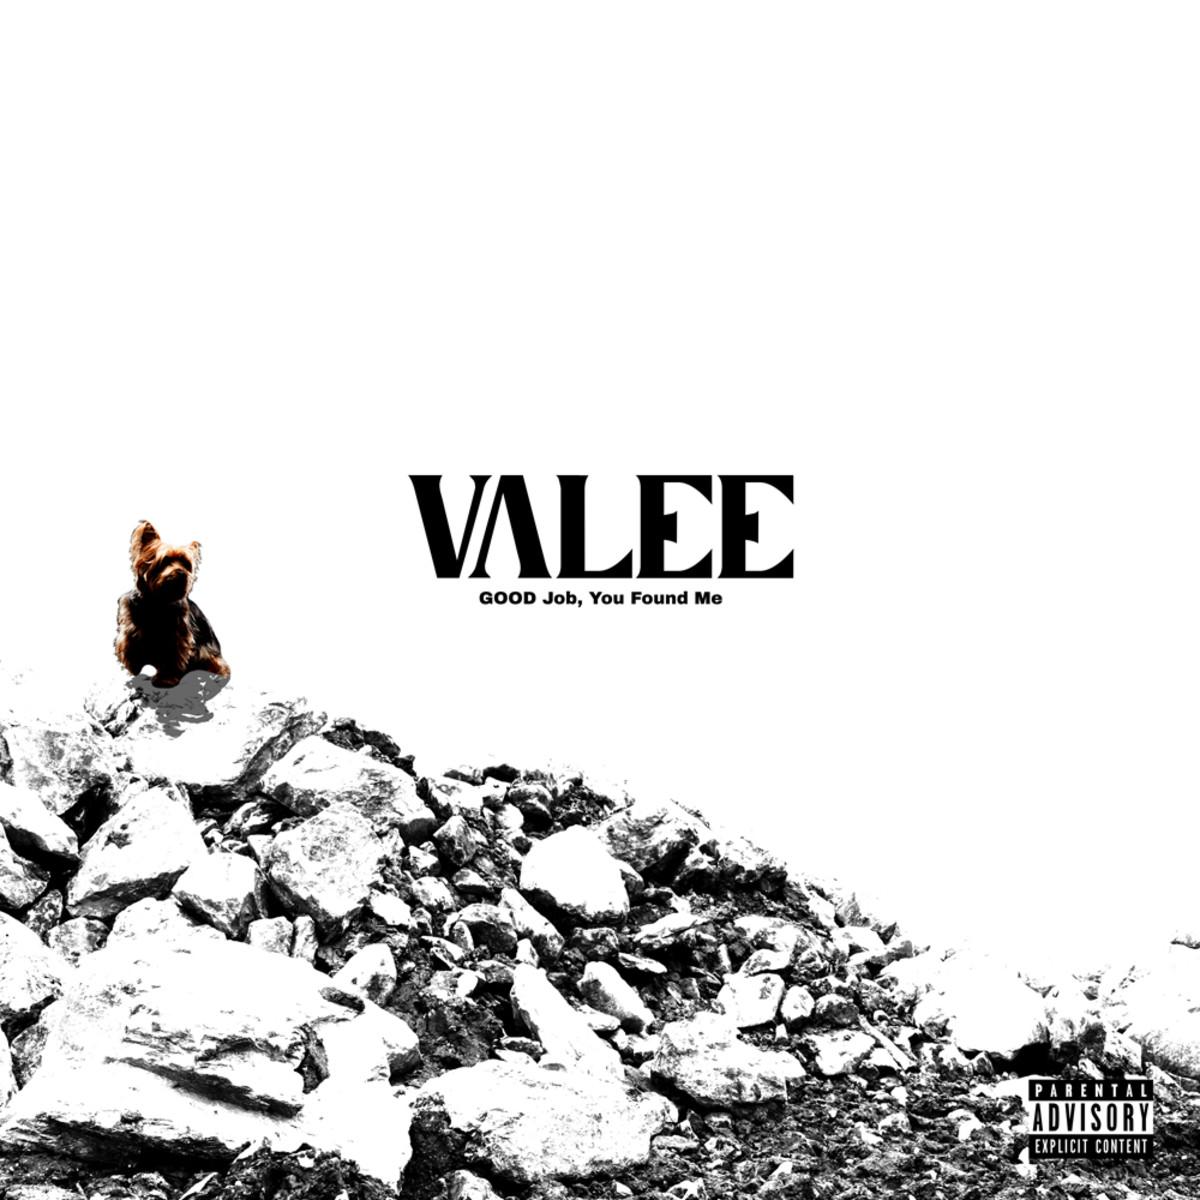 valee-good-job-you-found-me